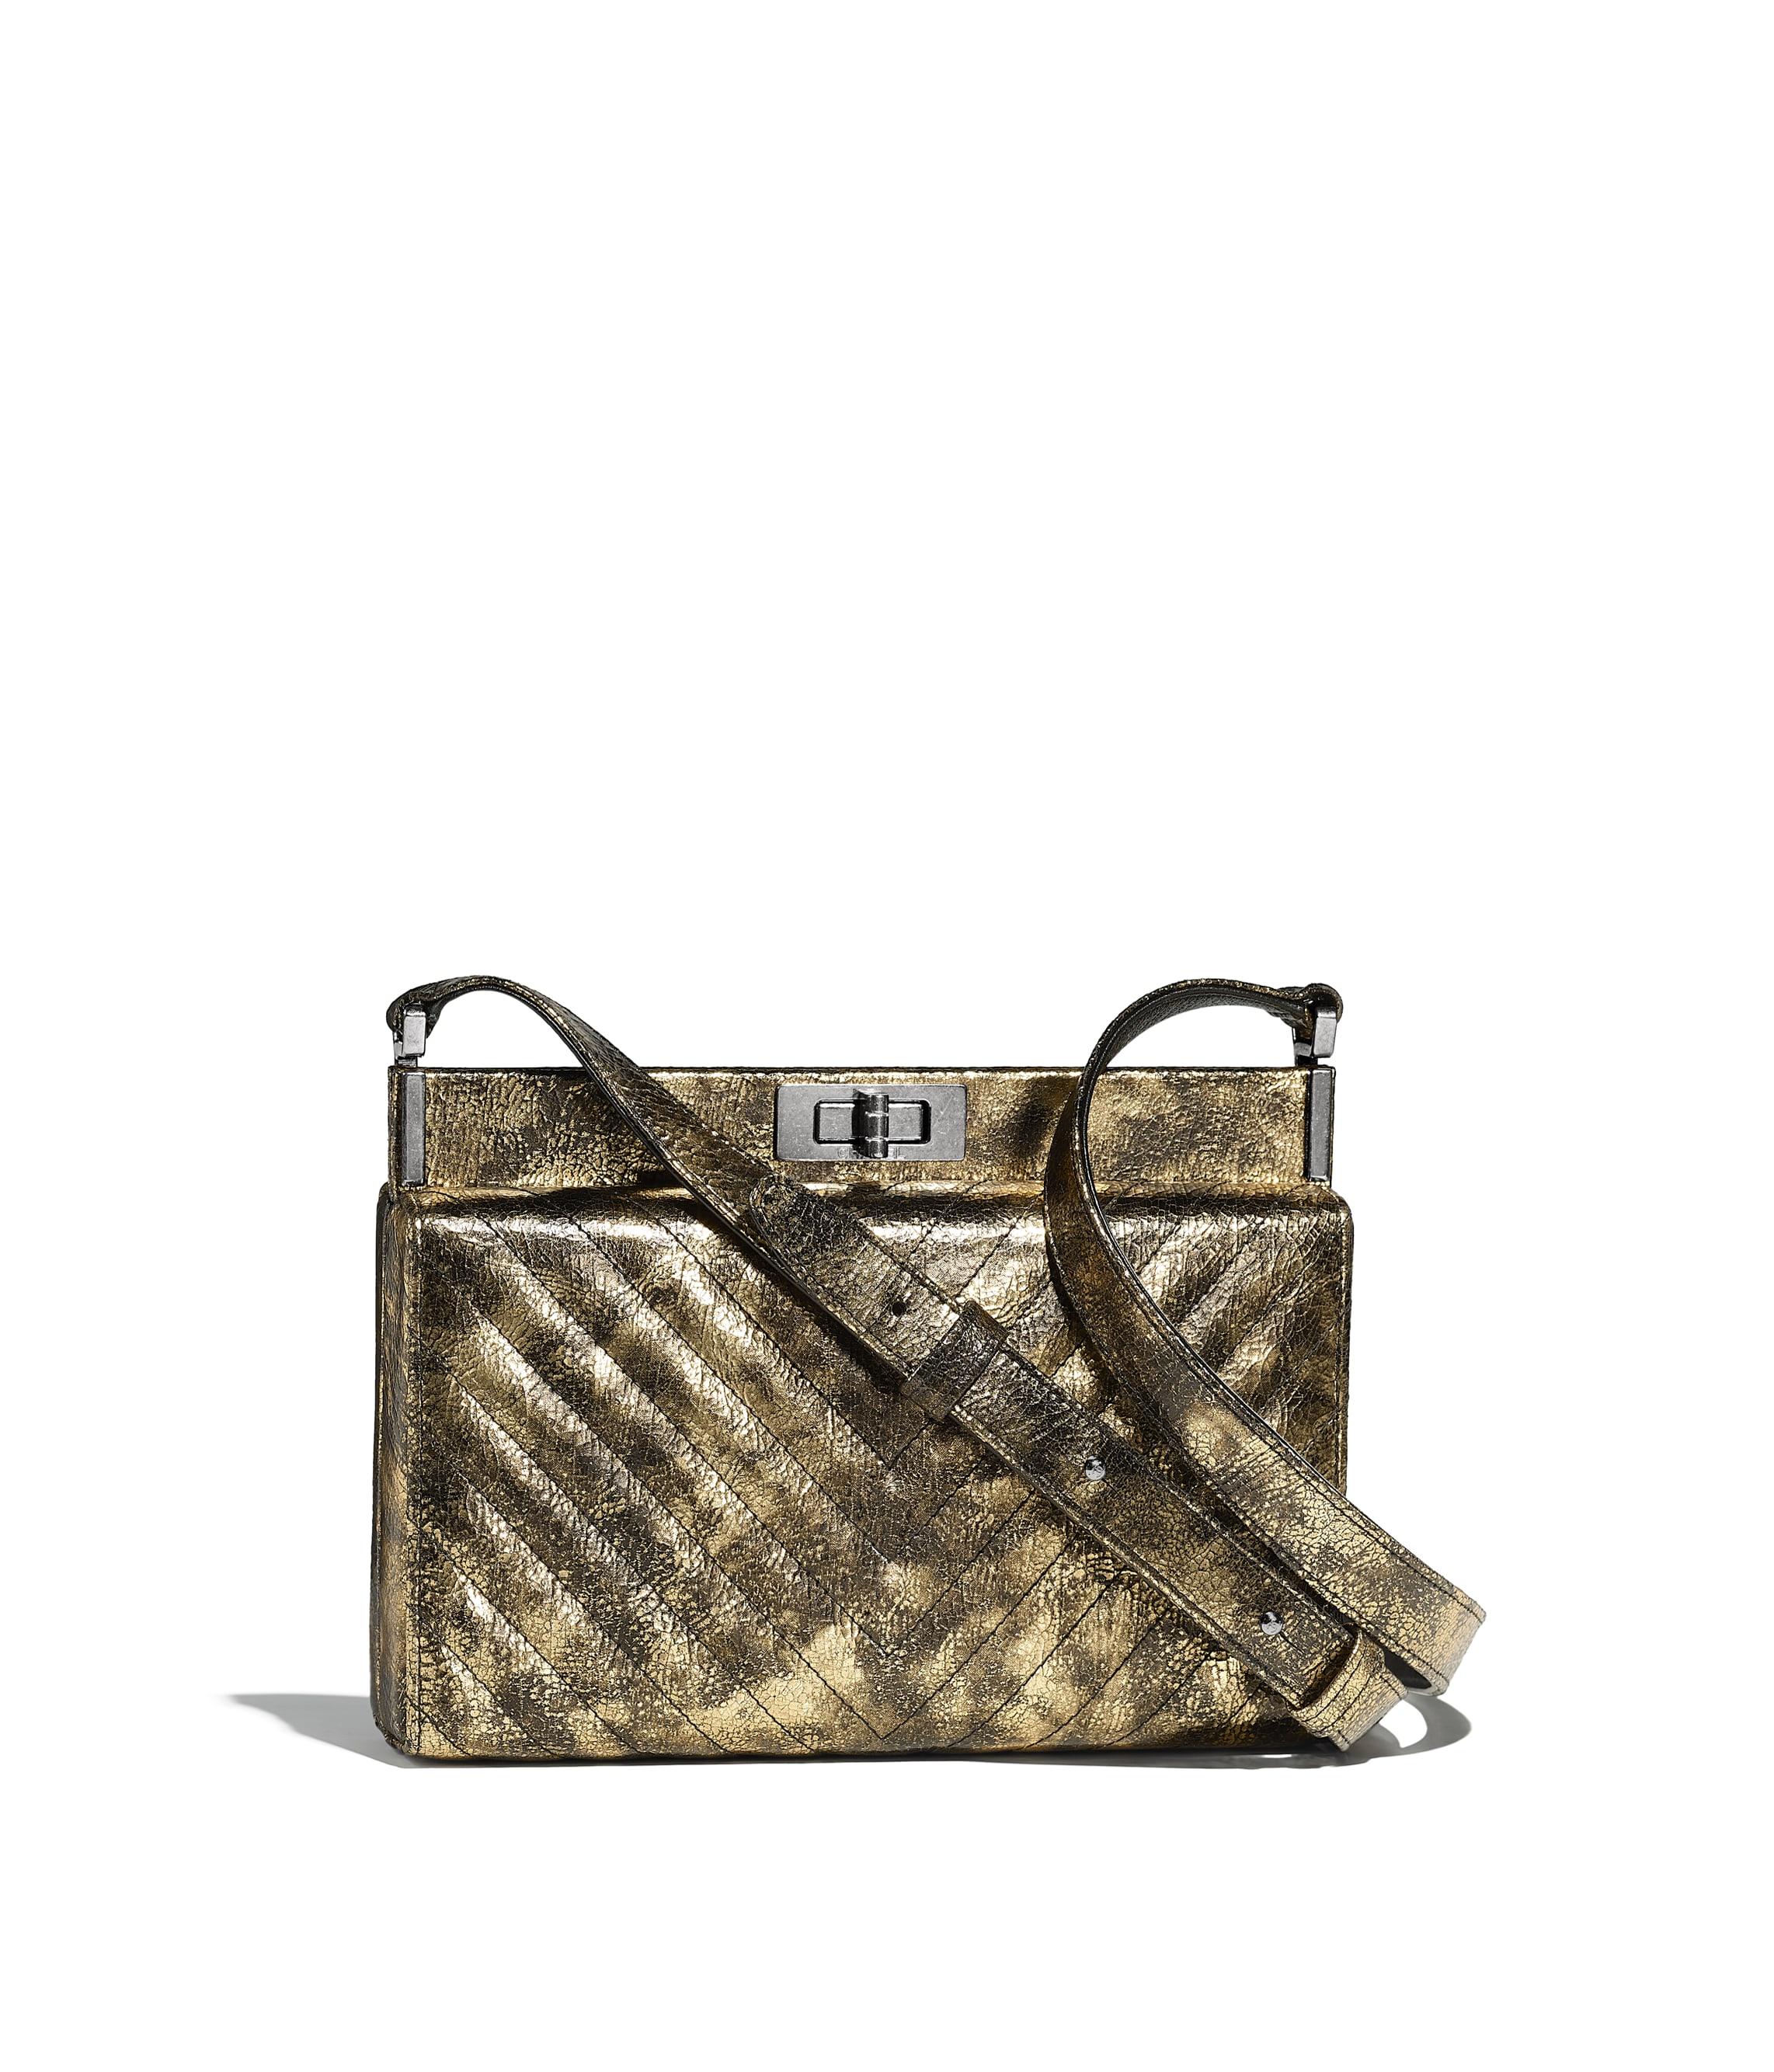 5282983a44 Chanel Xxl Travel Bag Price